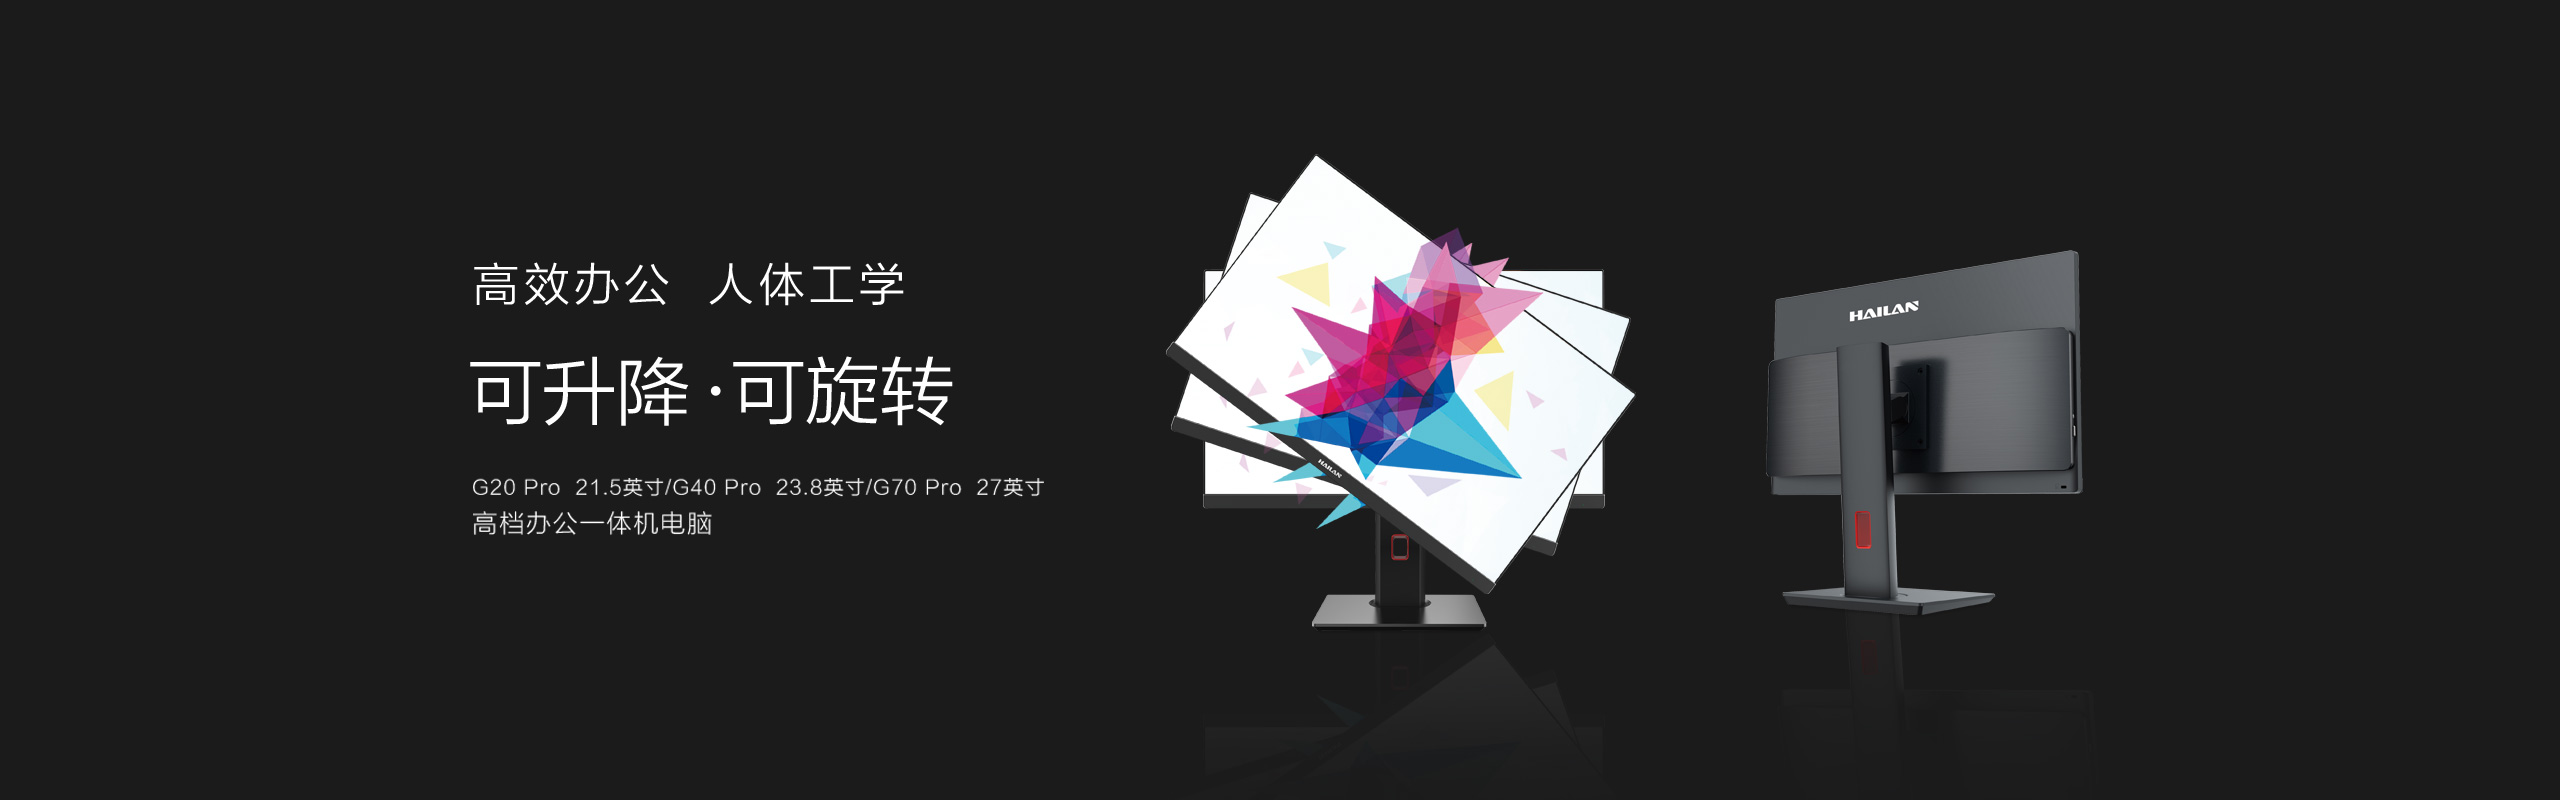 中文G20 Pro  G40 Pro G70 Pro